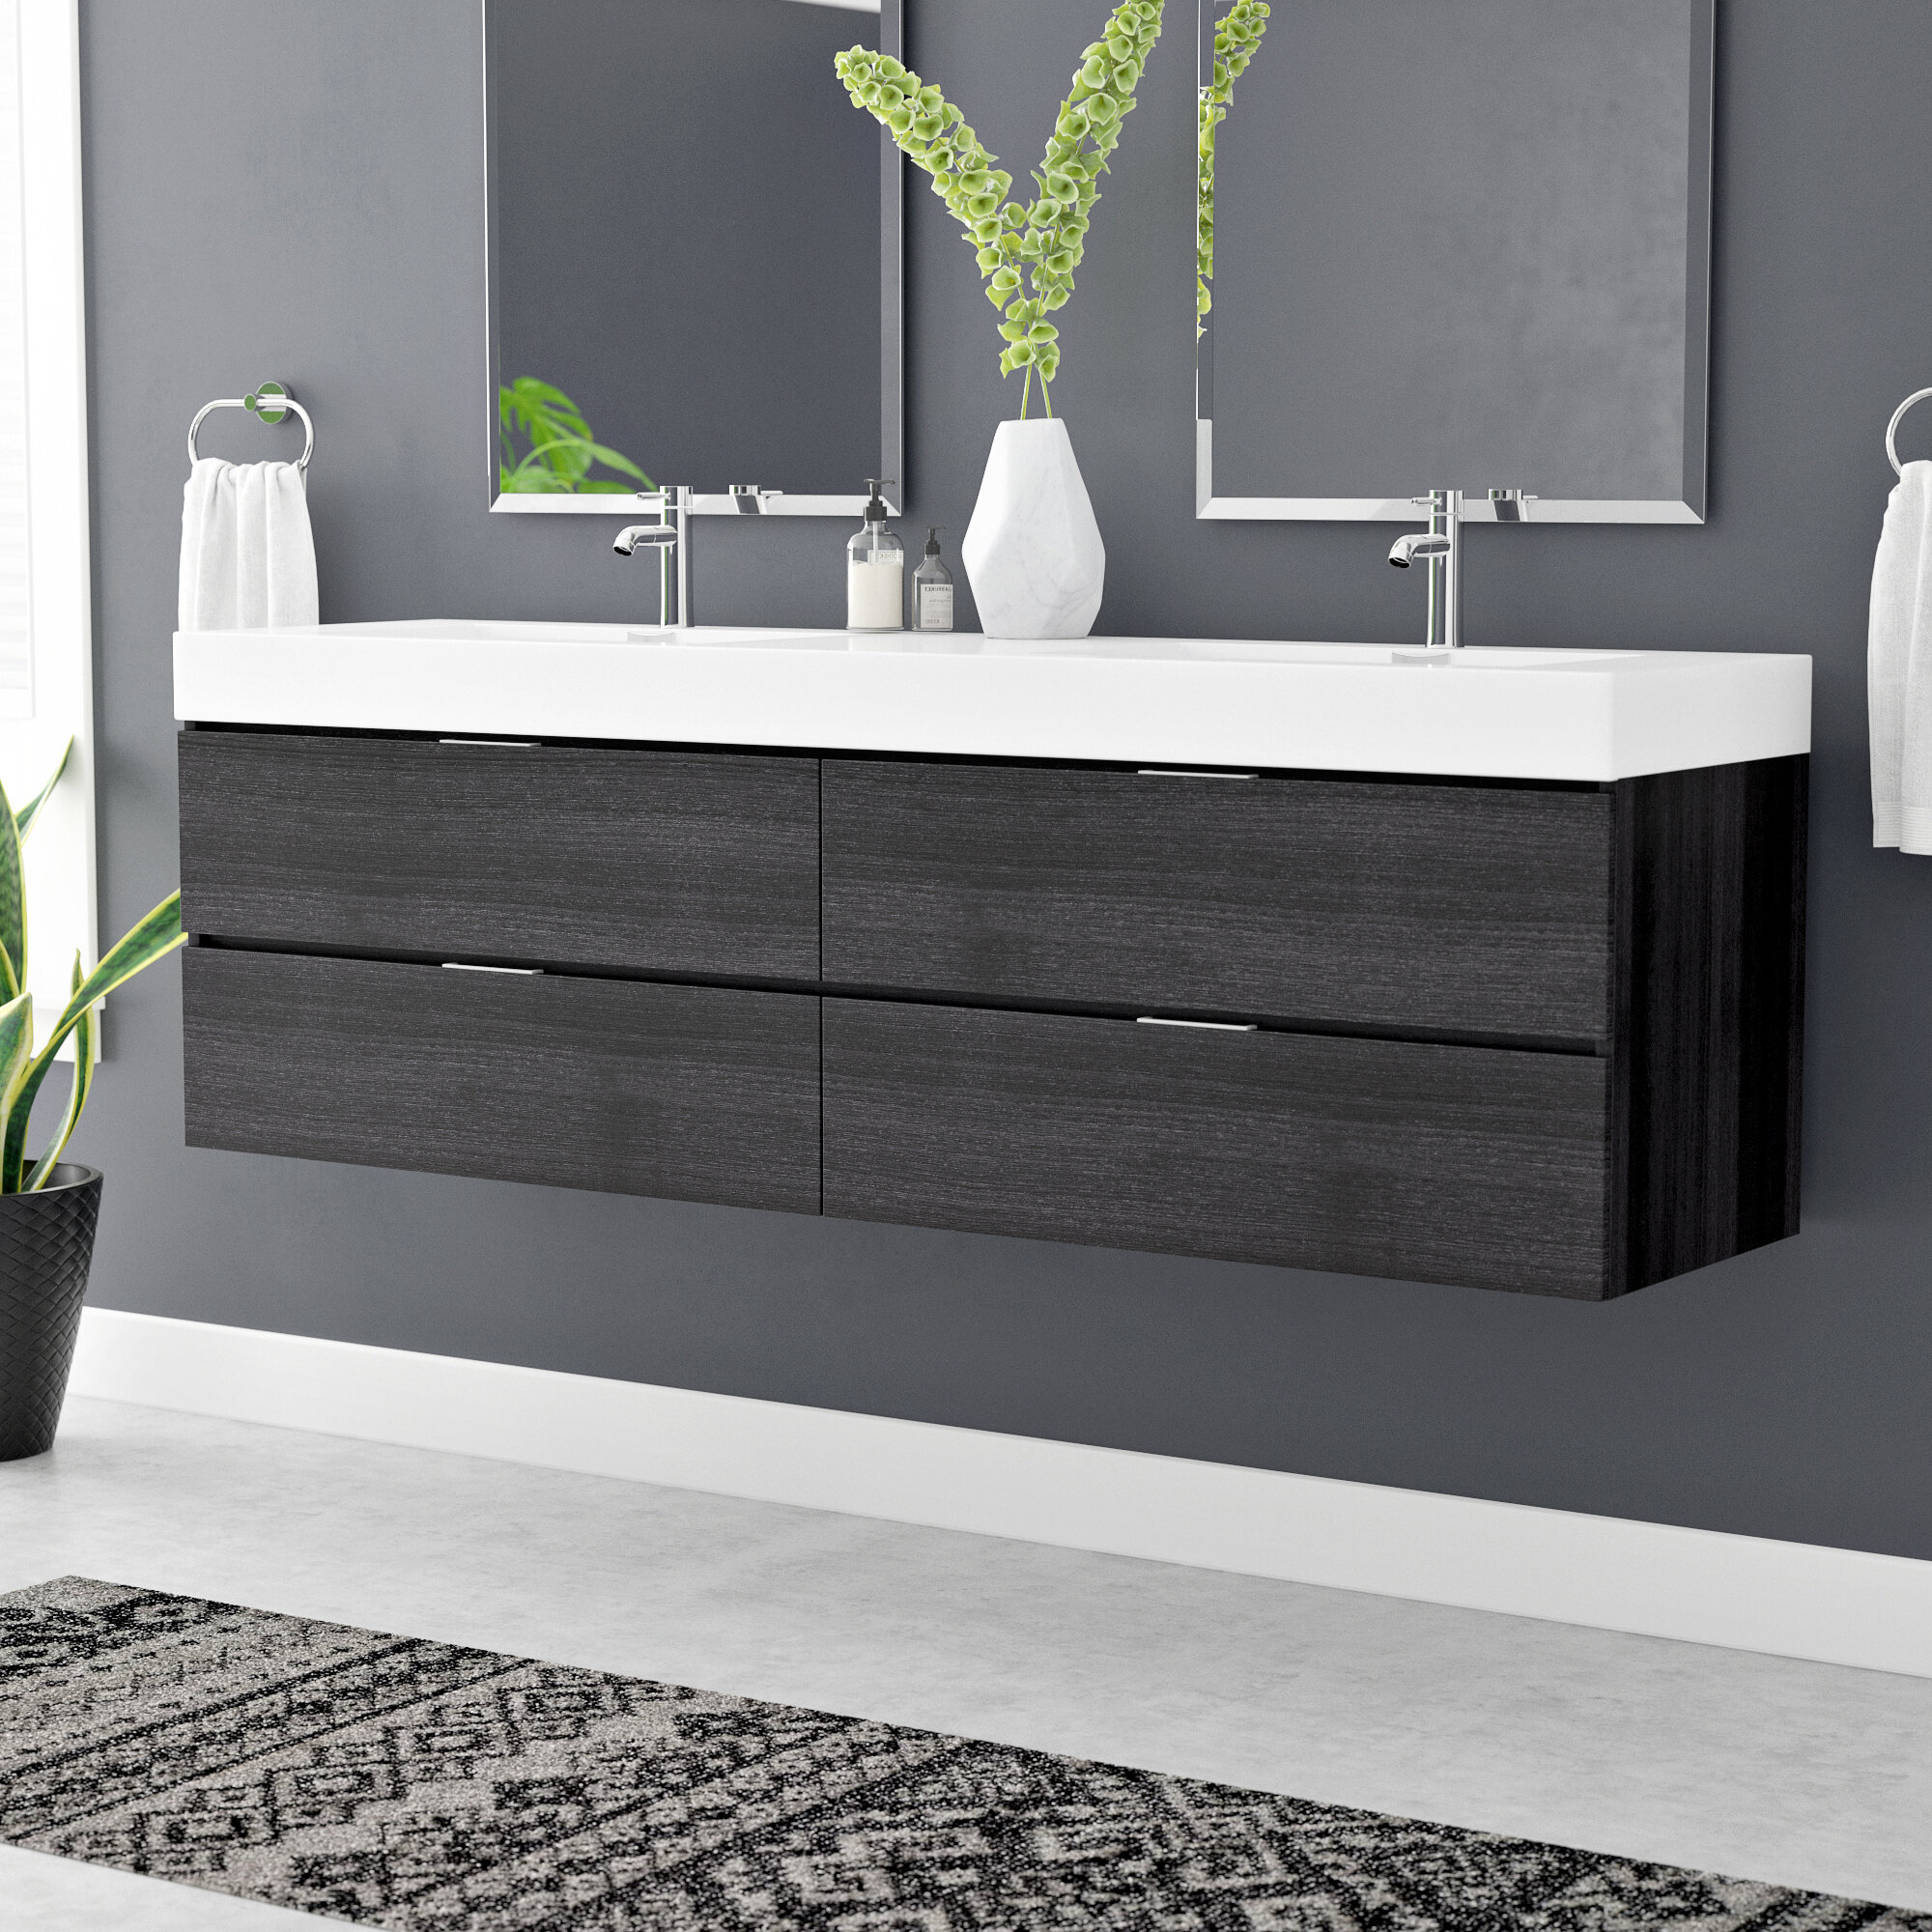 Wade Logan Tenafly 72 Wall Mounted Double Bathroom Vanity Set Reviews Wayfair